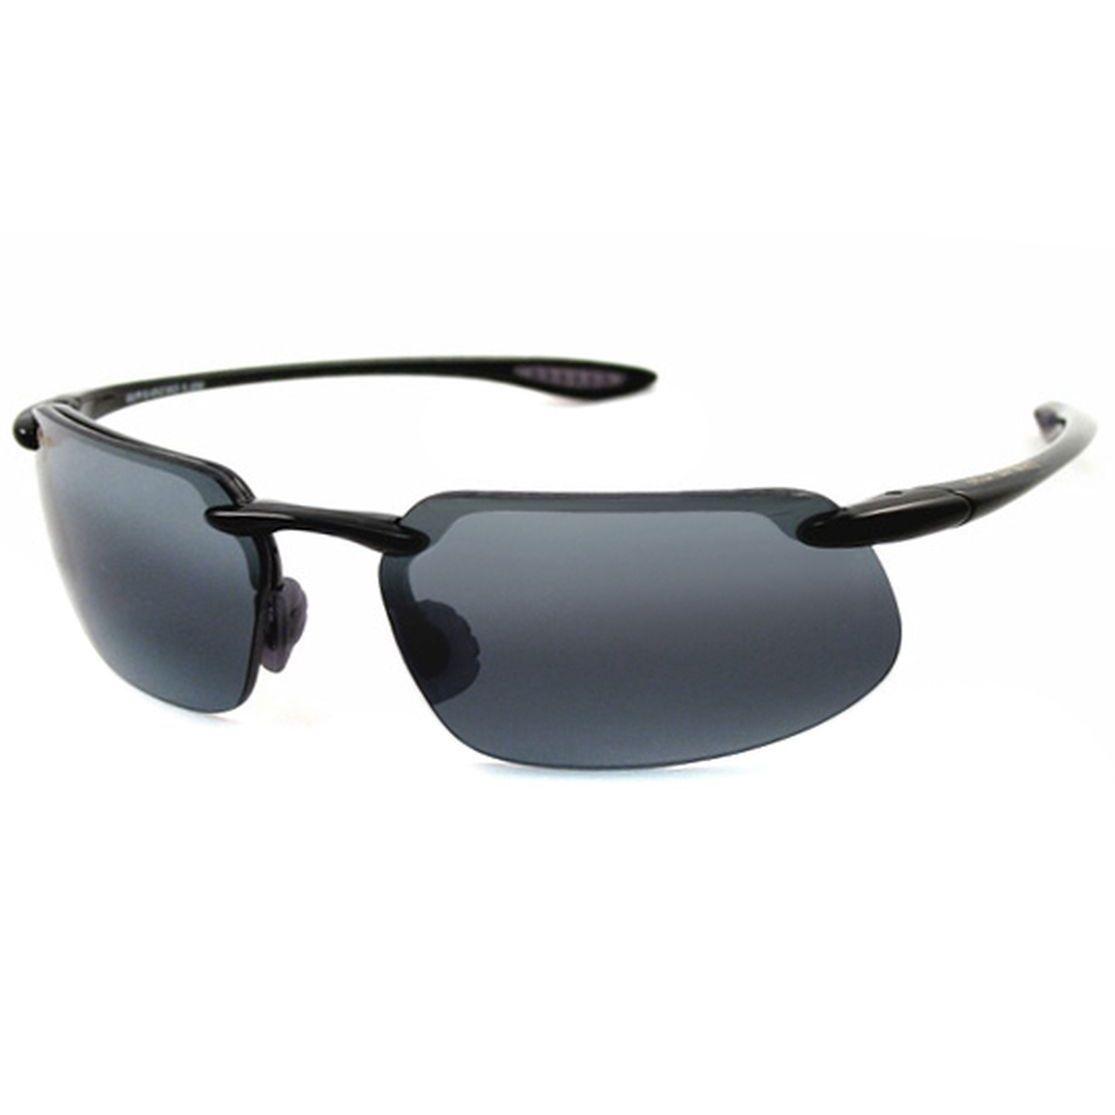 8e10f0373a470 Maui Jim Men s  Stingray Kanaha  Polarized Sport Sunglasses